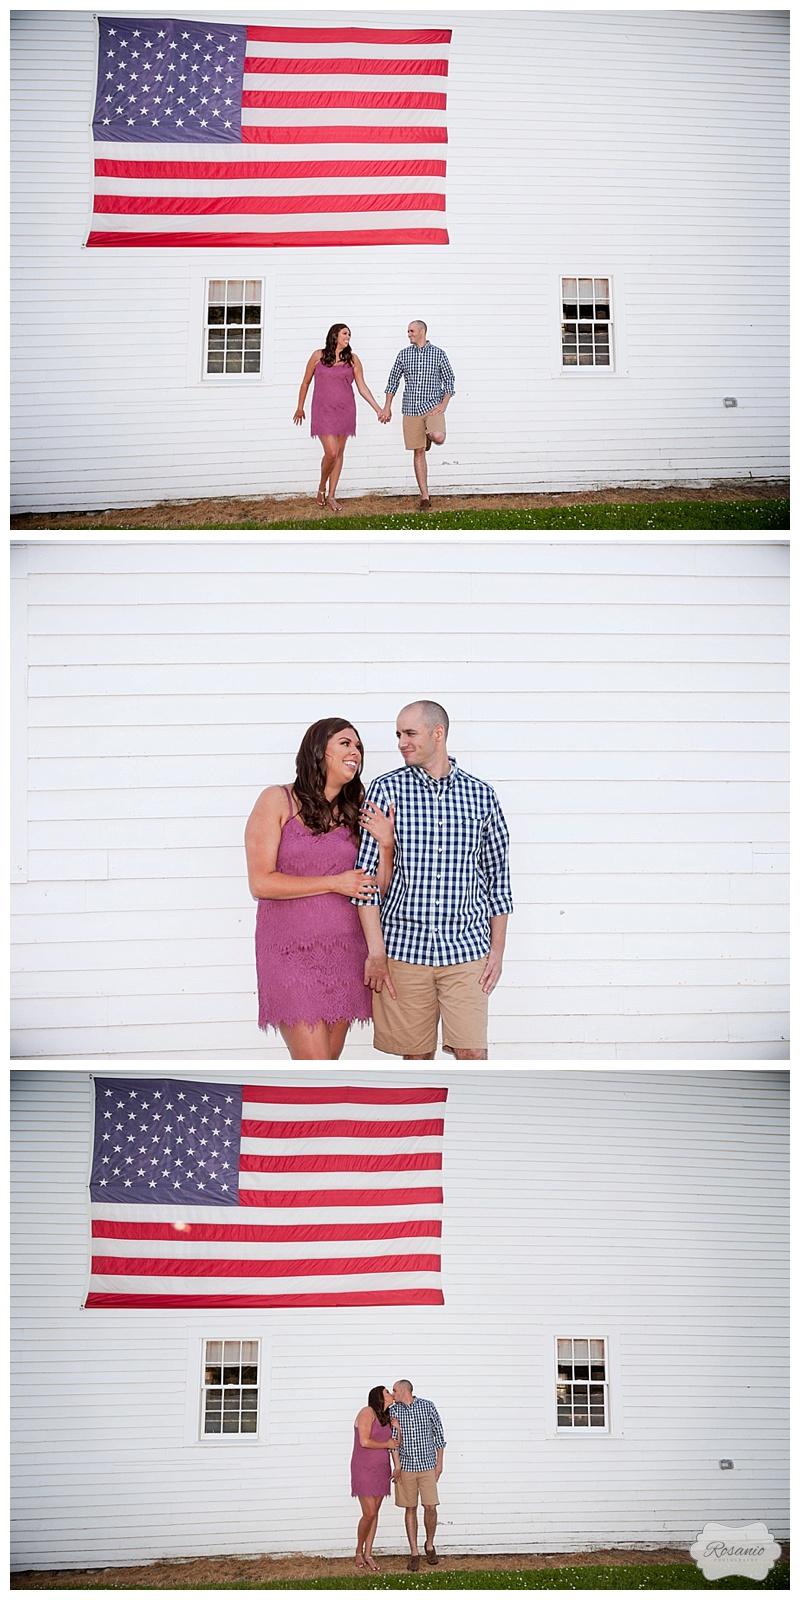 Rosanio Photography | Merrimack Valley Golf Course Wedding | m New Hampshire | Massachusetts Wedding Photographer_0091.jpg